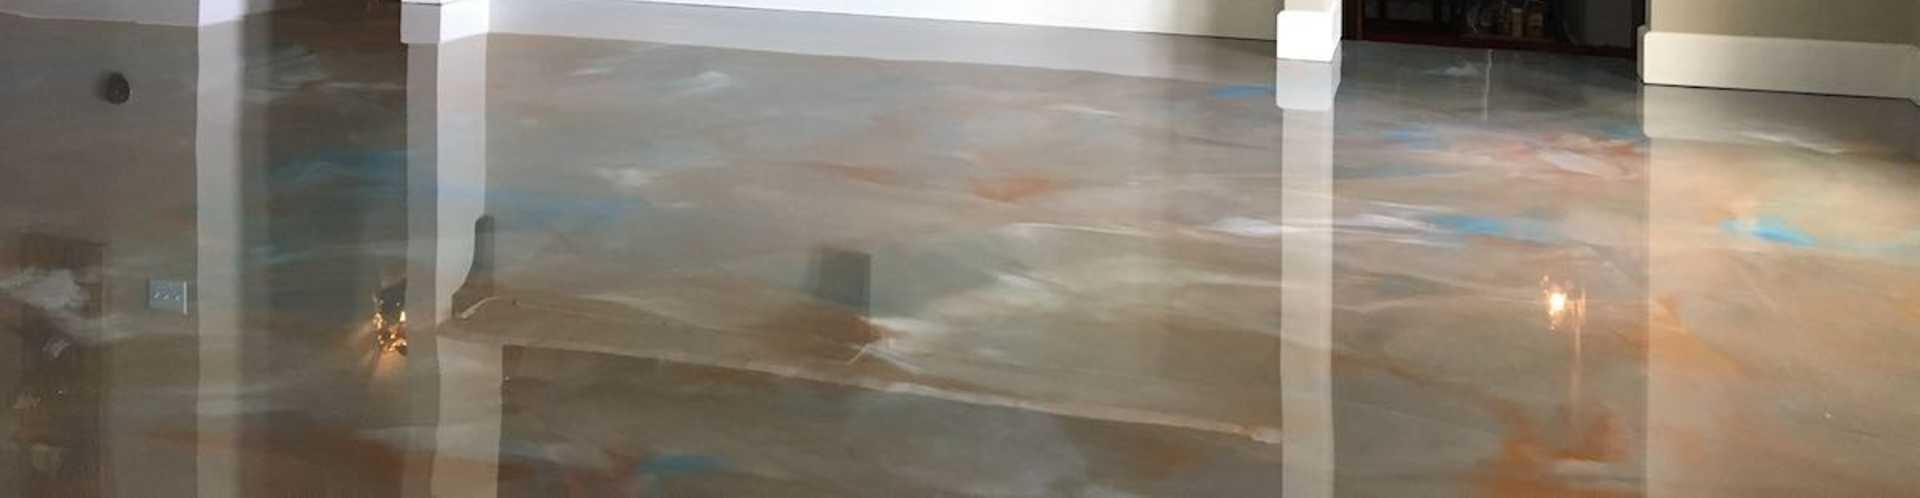 Finished Basement Floor | Basement Flooring Ideas